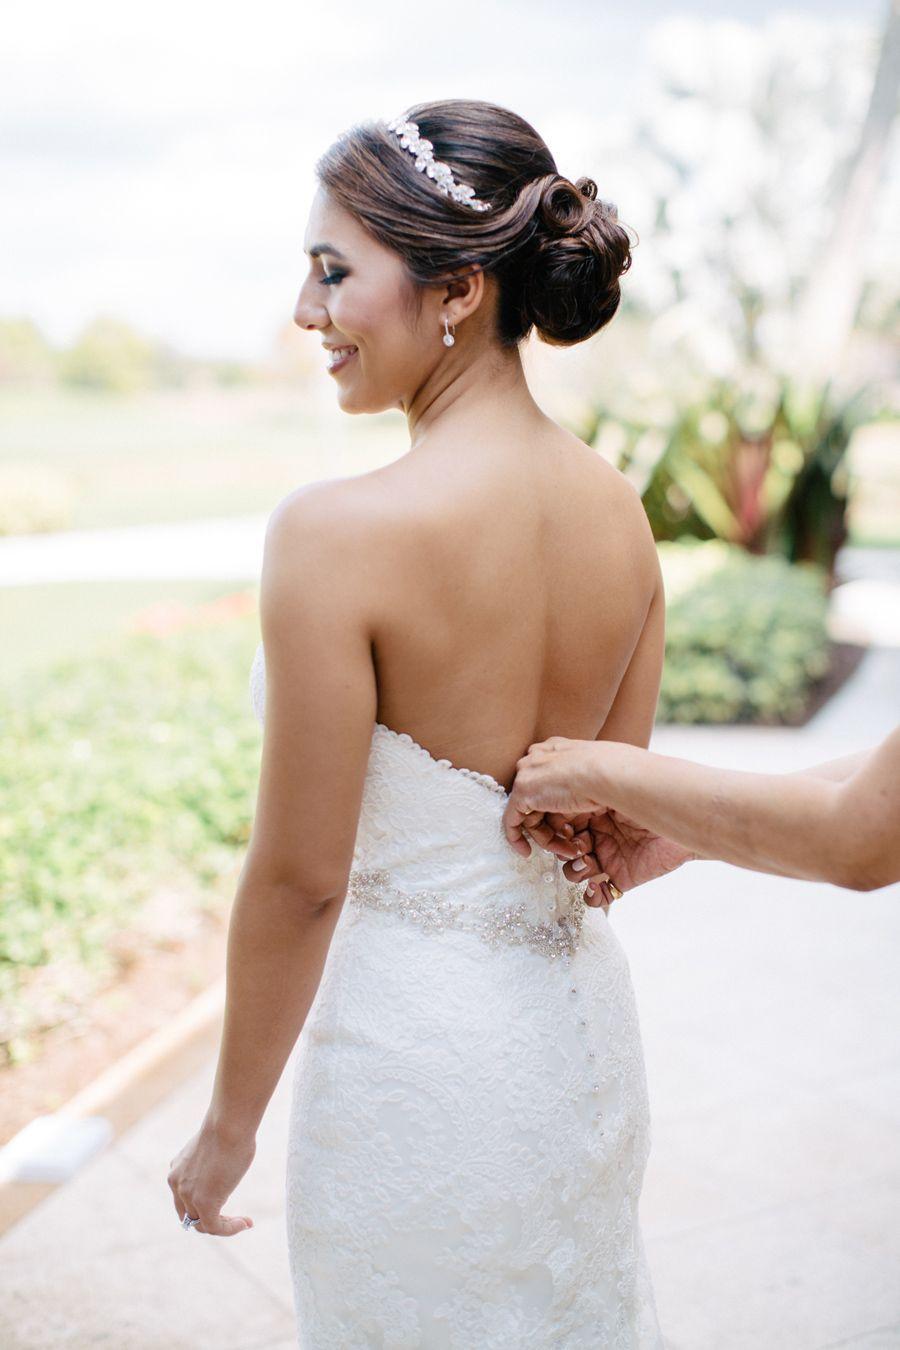 Ashley + Chad's Outdoor Wedding || http://www.erikadelgado.com/2017/03/28/ashley-chad-married-at-dusk-in-parkland-fl/